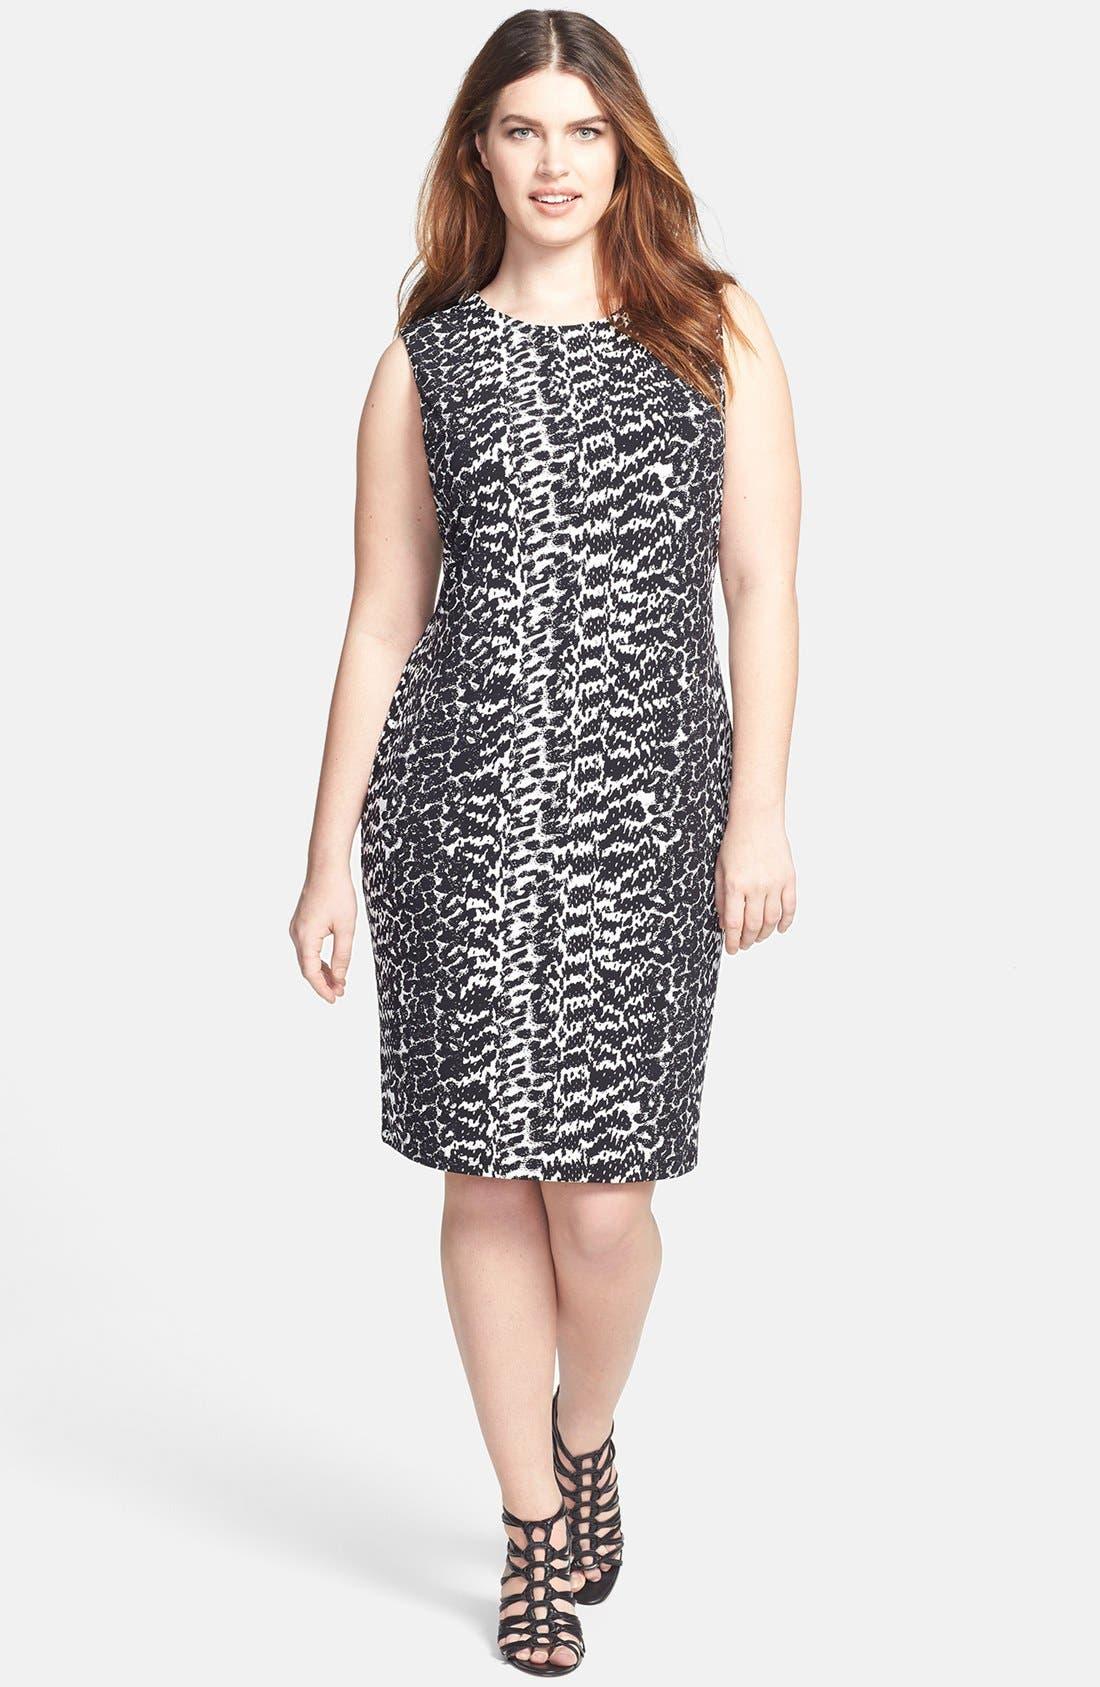 Main Image - Vince Camuto 'Animal Tracks' Sleeveless Sheath Dress (Plus Size)